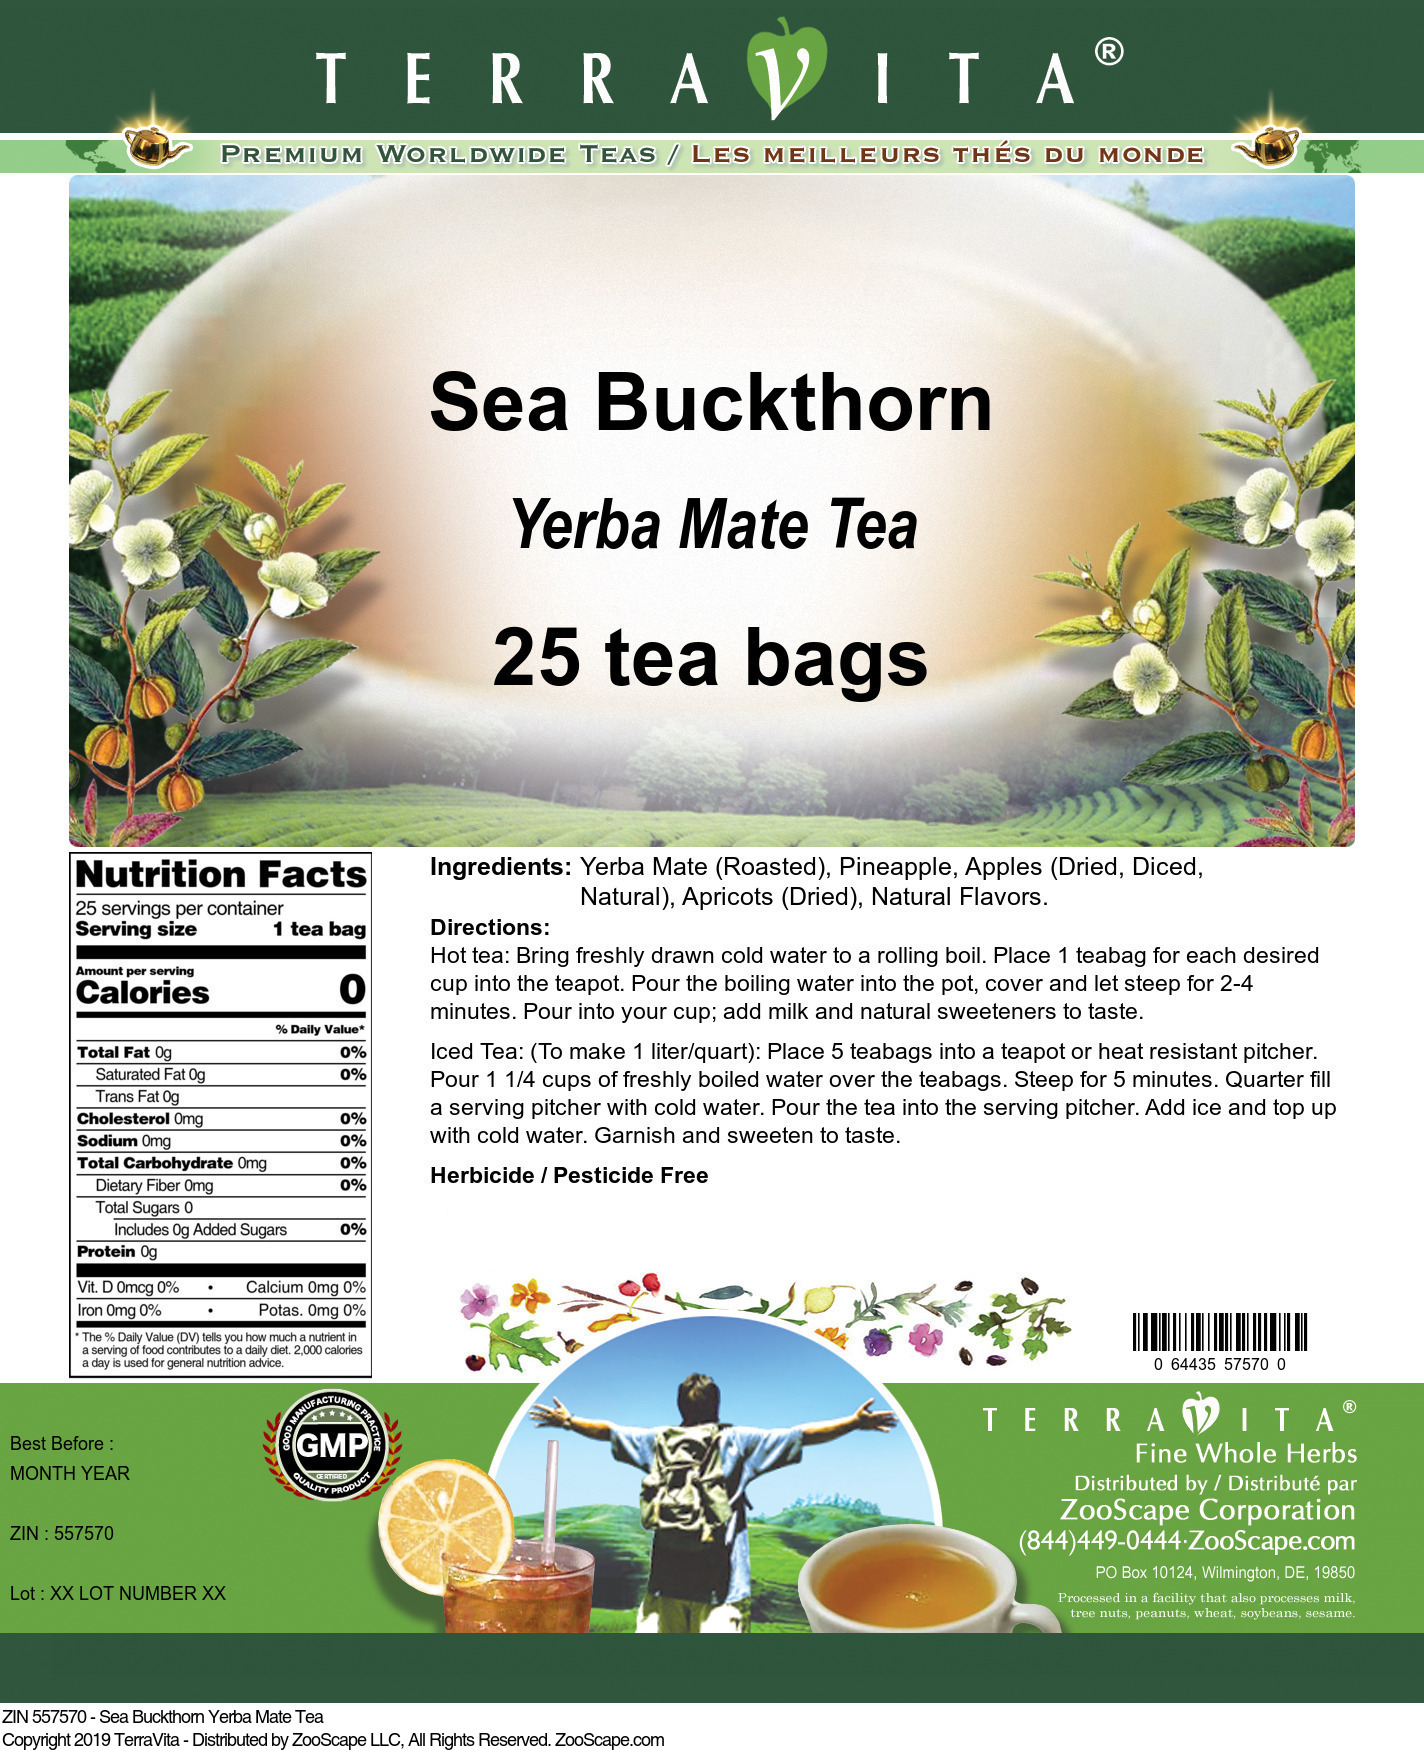 Sea Buckthorn Yerba Mate